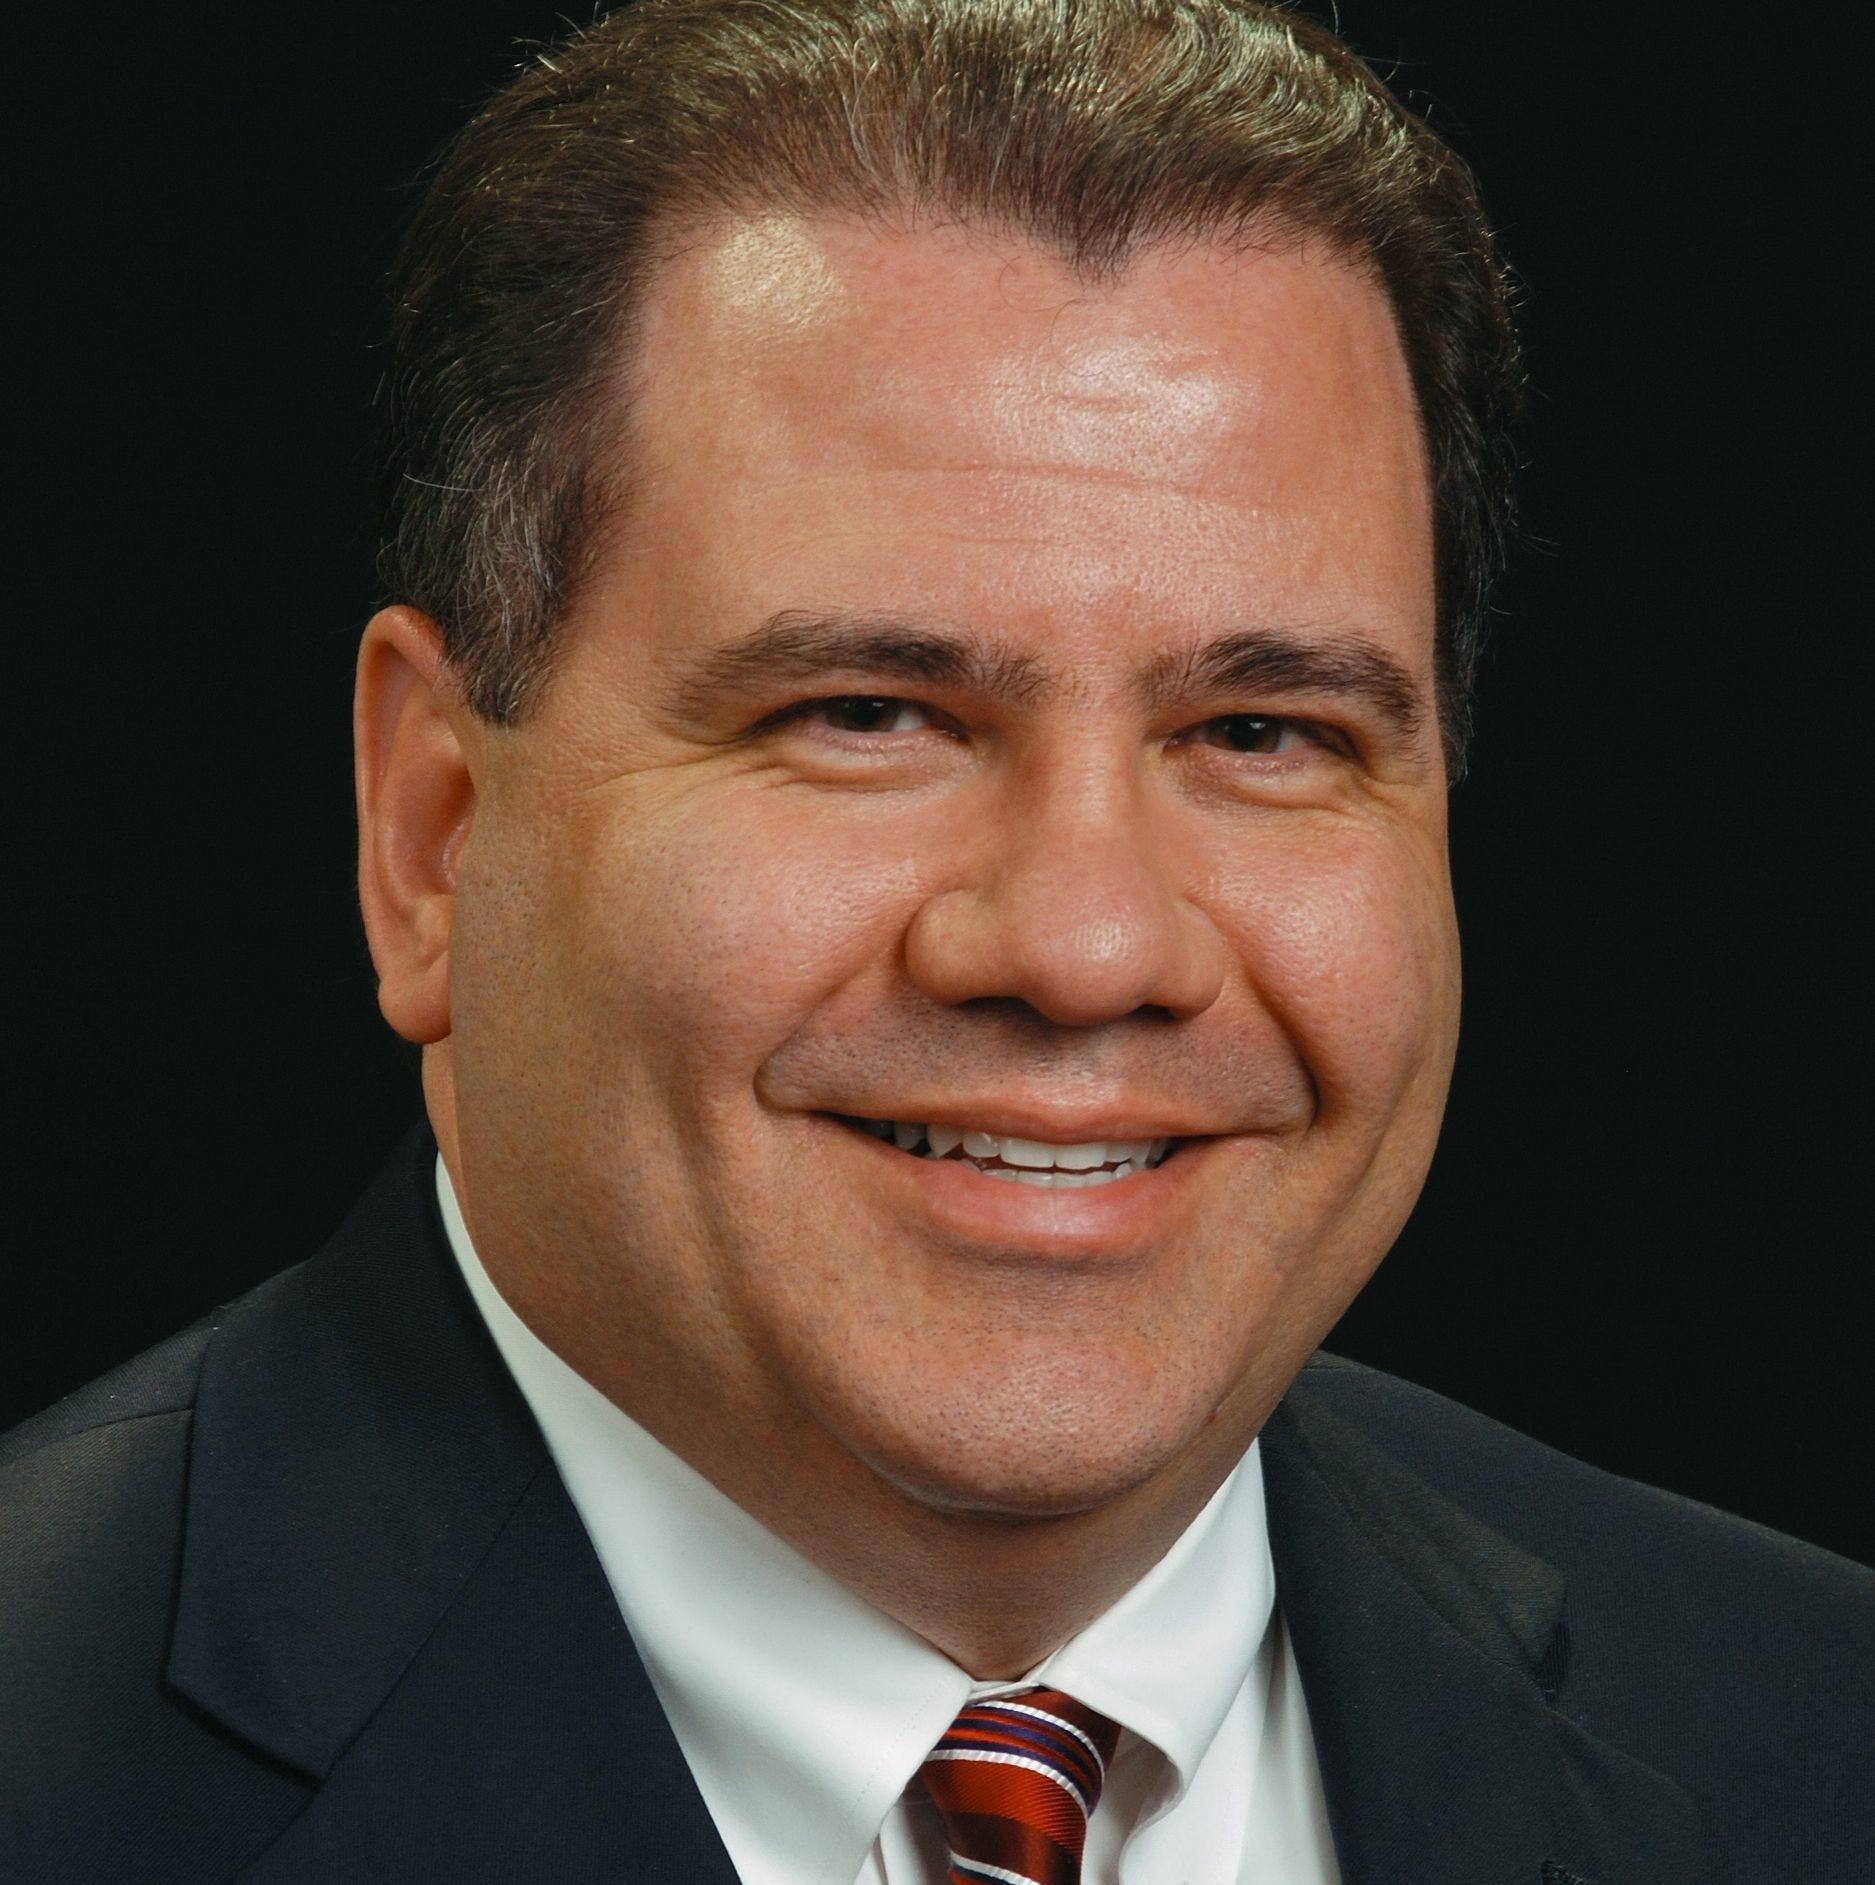 Tim Schaffer focused on re-election, not replacing Troy Balderson in Senate